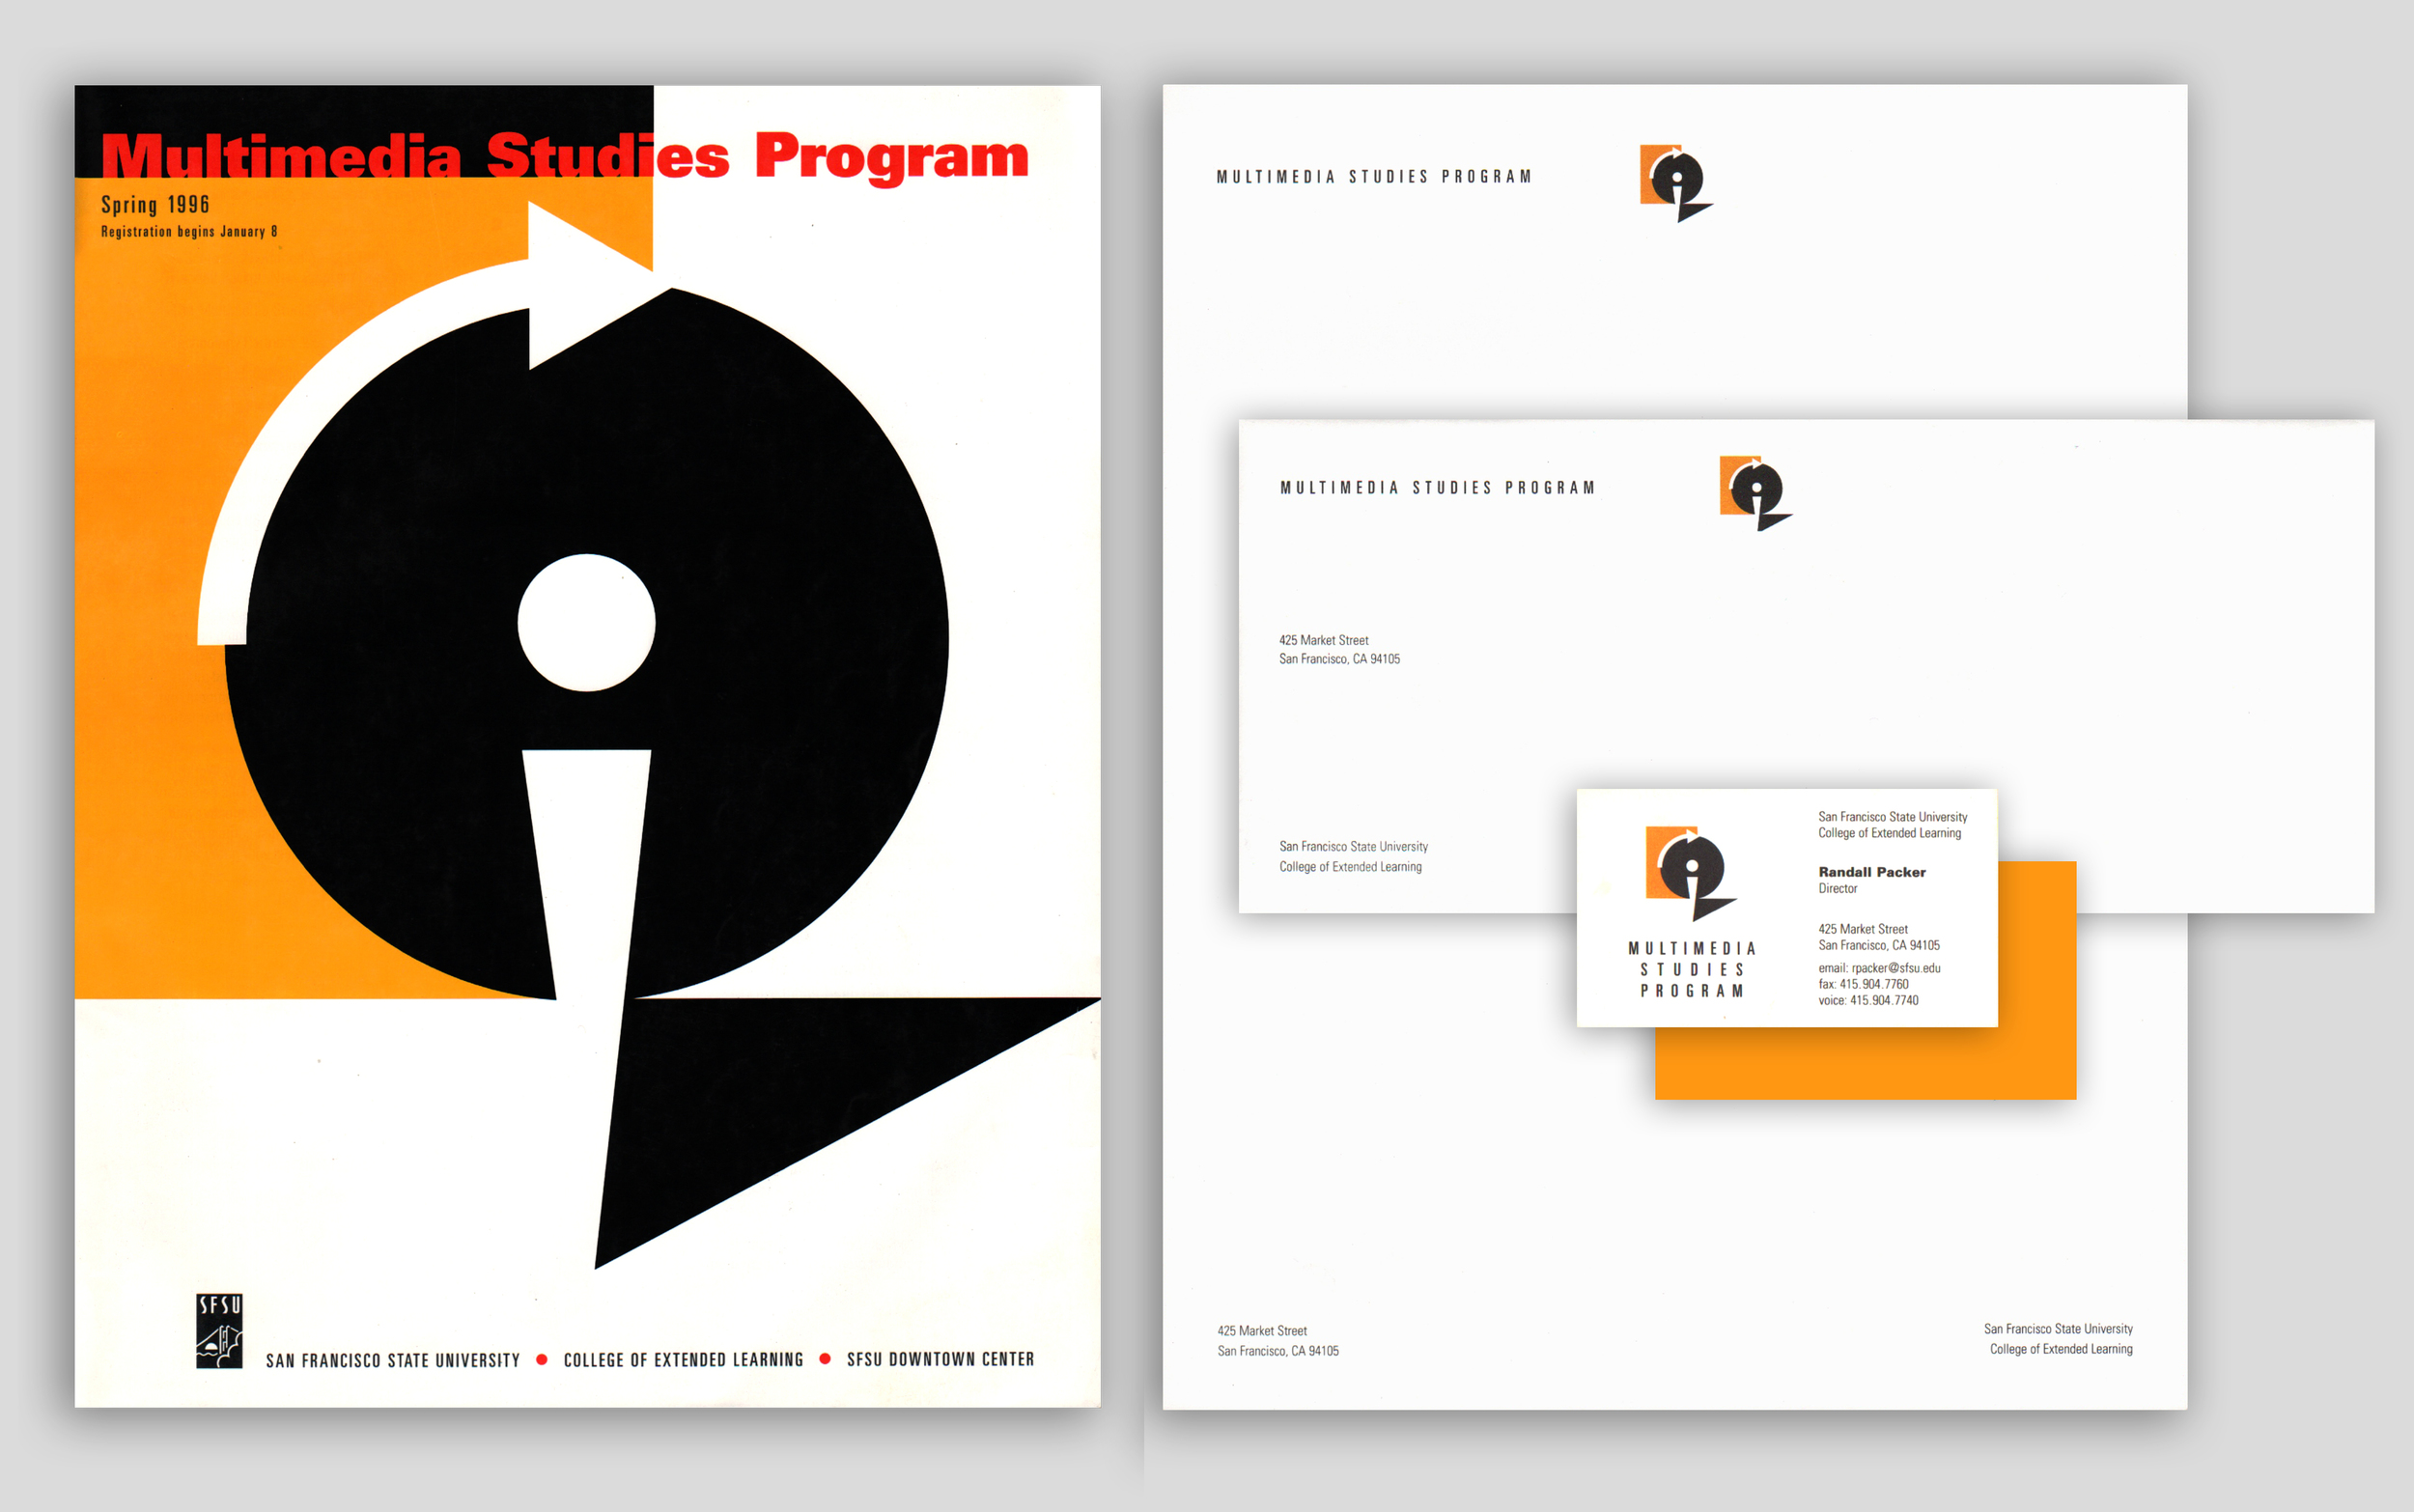 SFSU_MultimediaStudies_branding.jpg